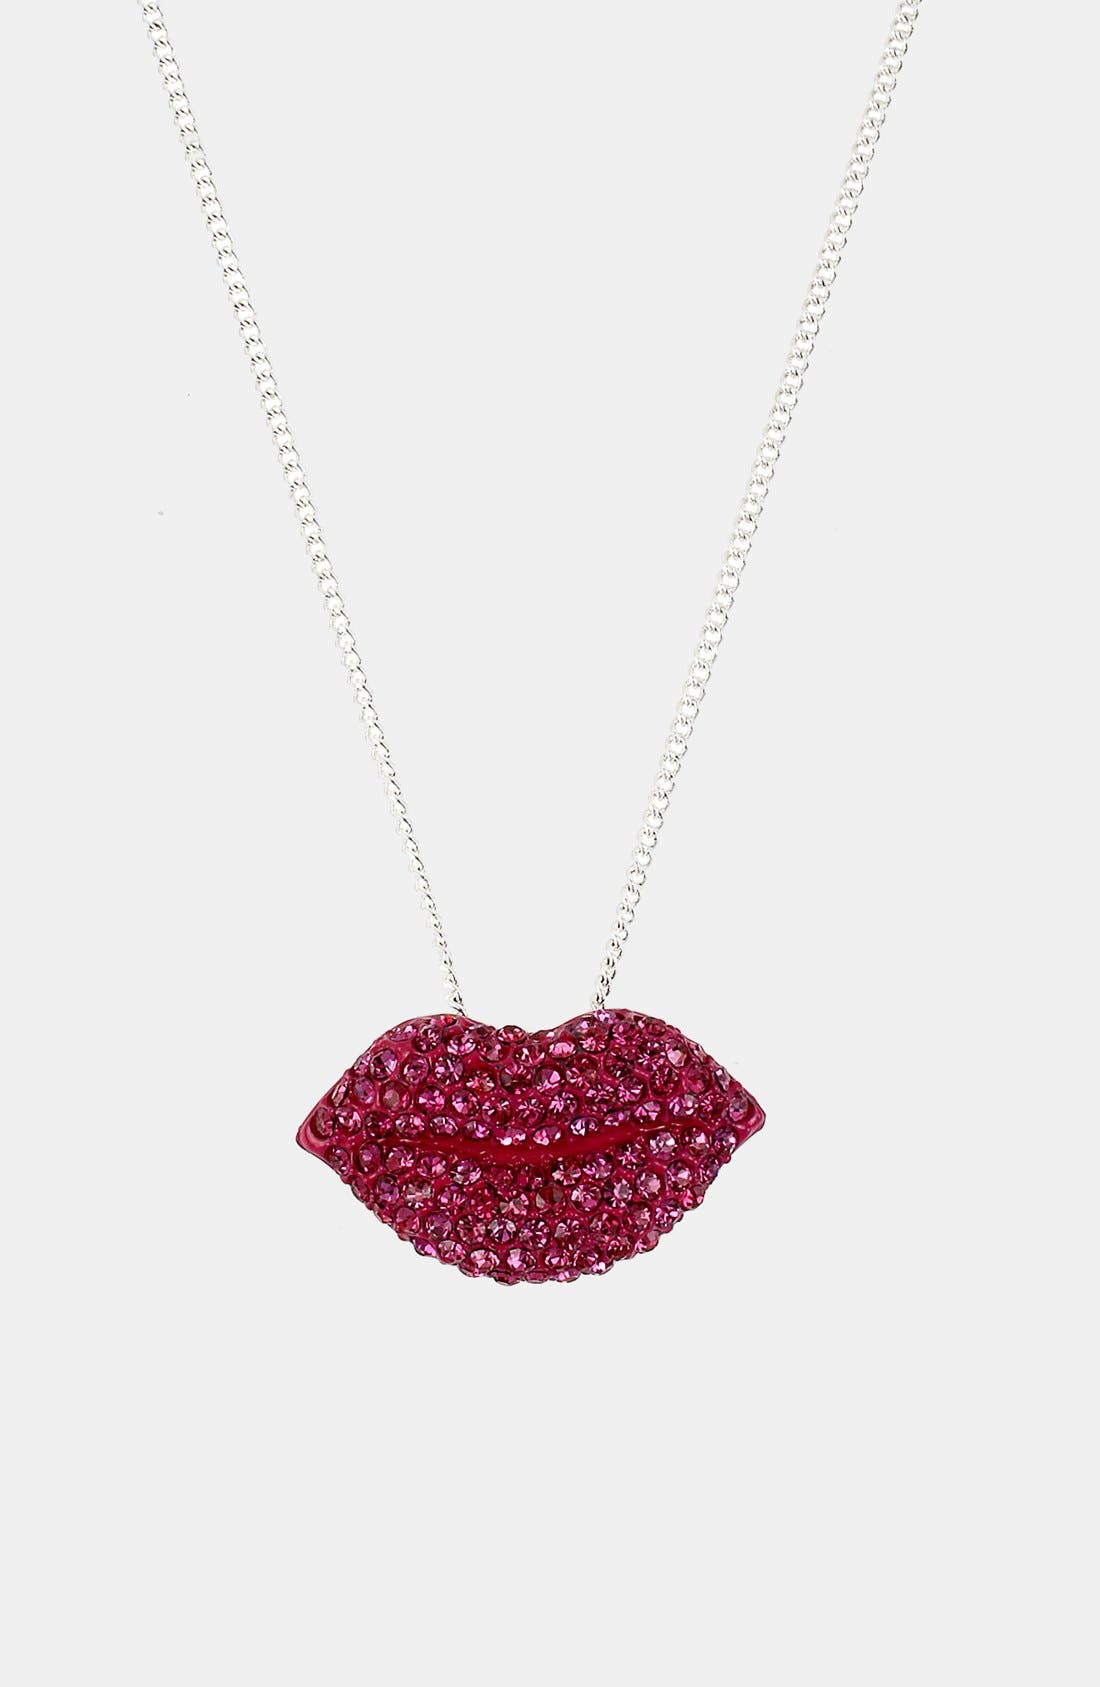 Alternate Image 1 Selected - Betsey Johnson 'Girlie' Pendant Necklace